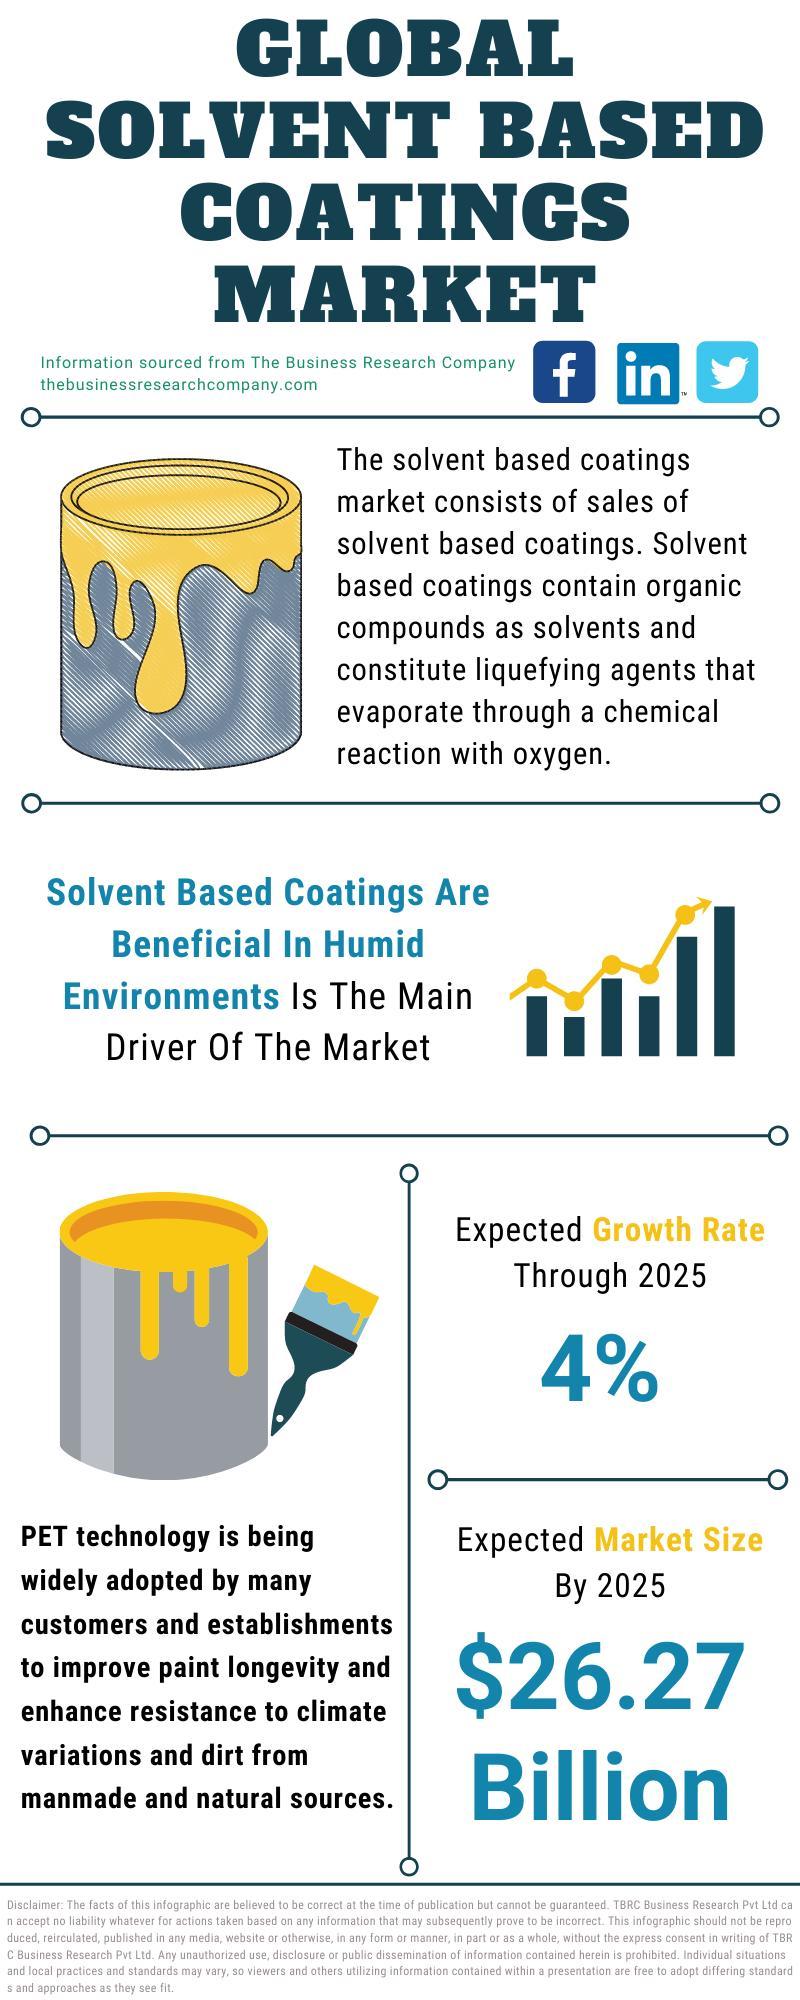 Solvent Based Coatings Market